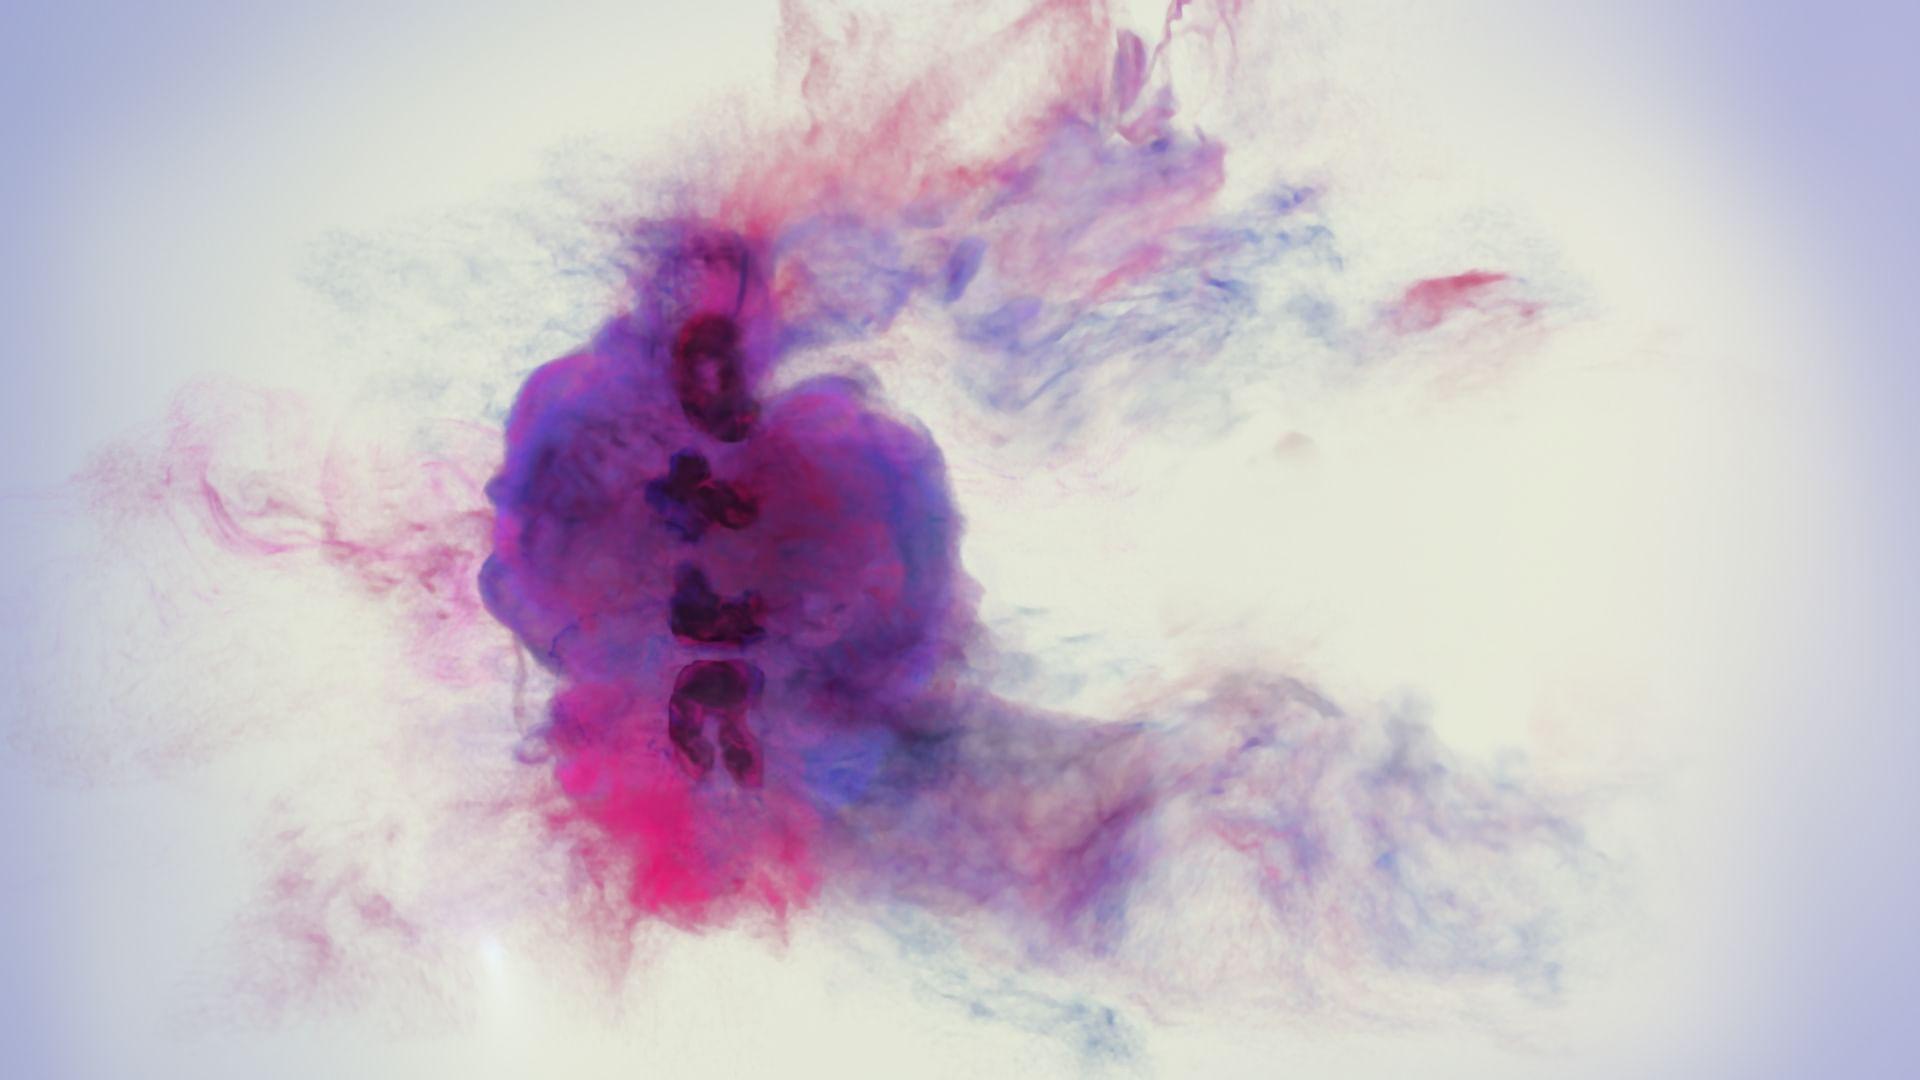 BiTS - Stop motion